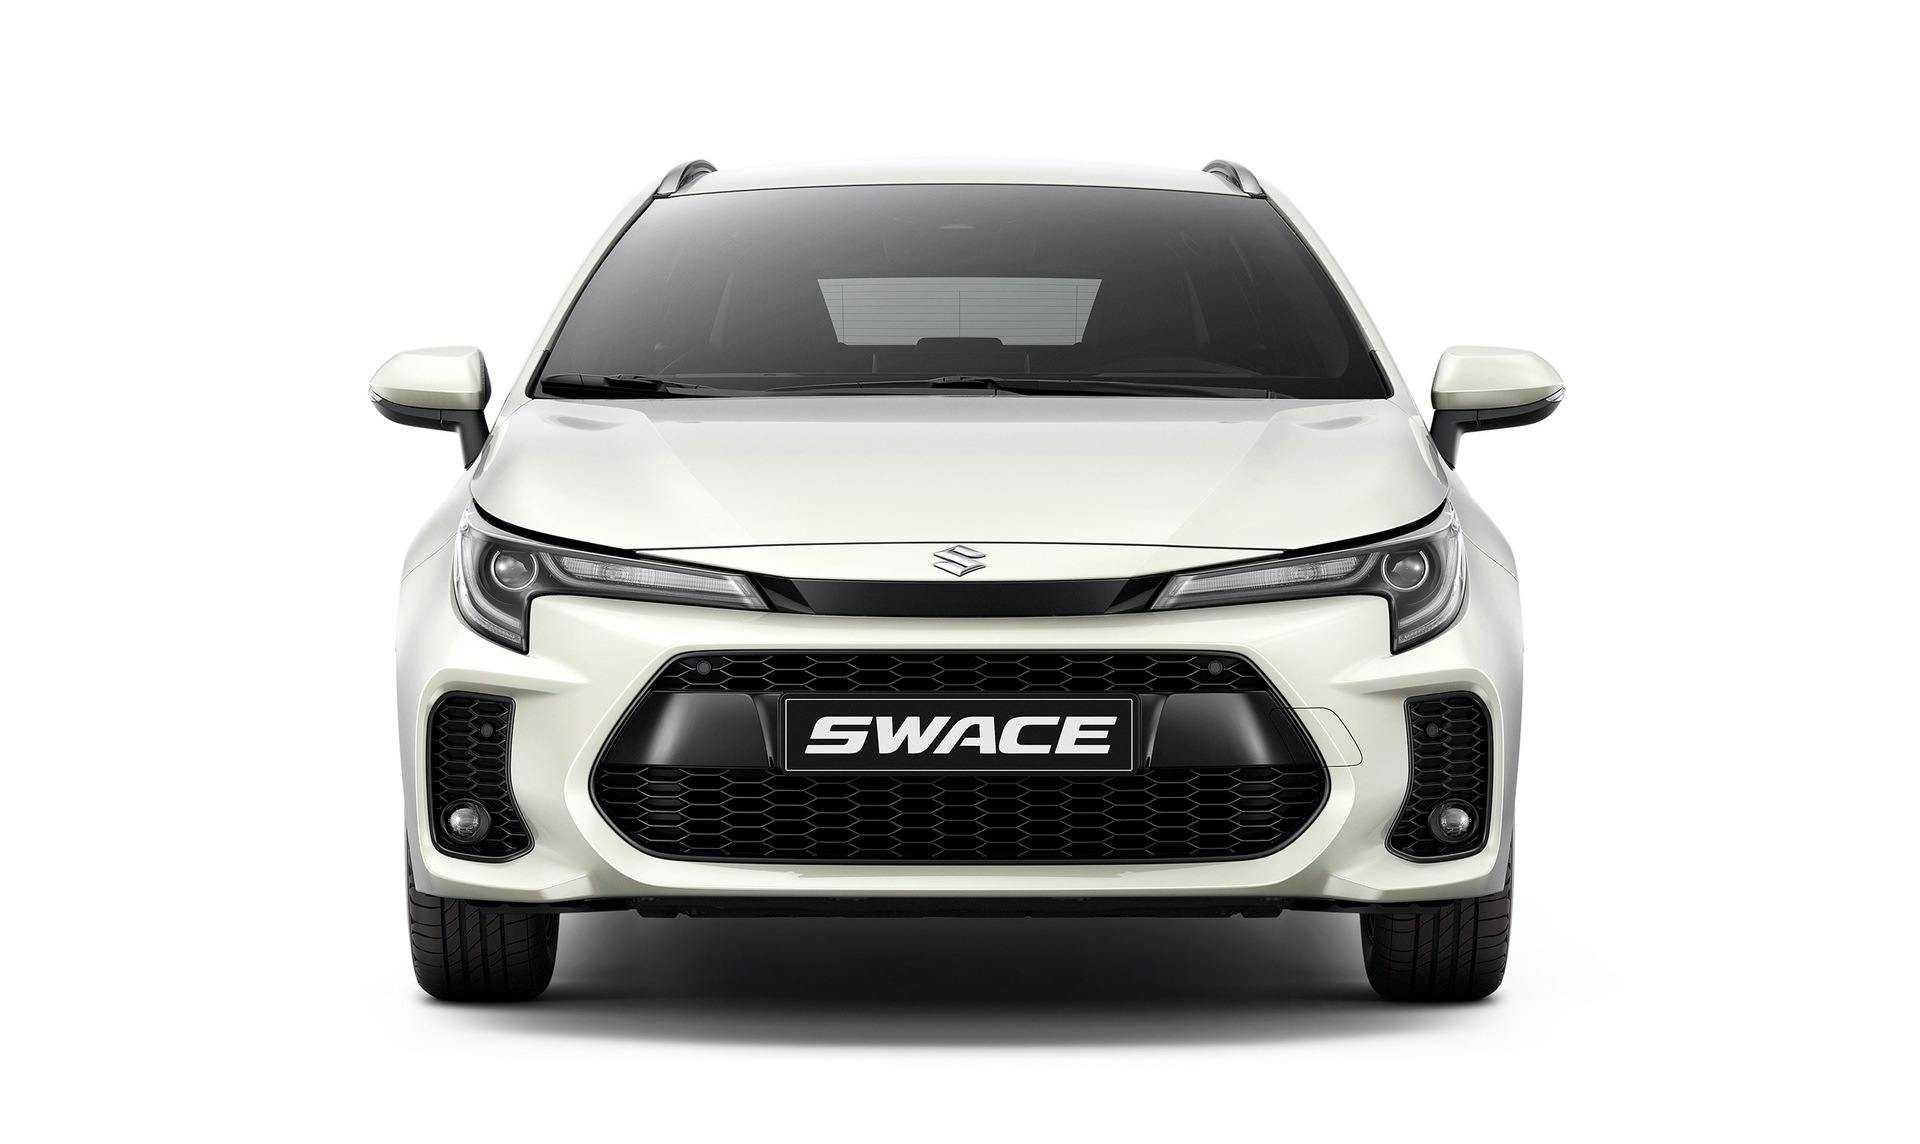 Suzuki_Swace_0001